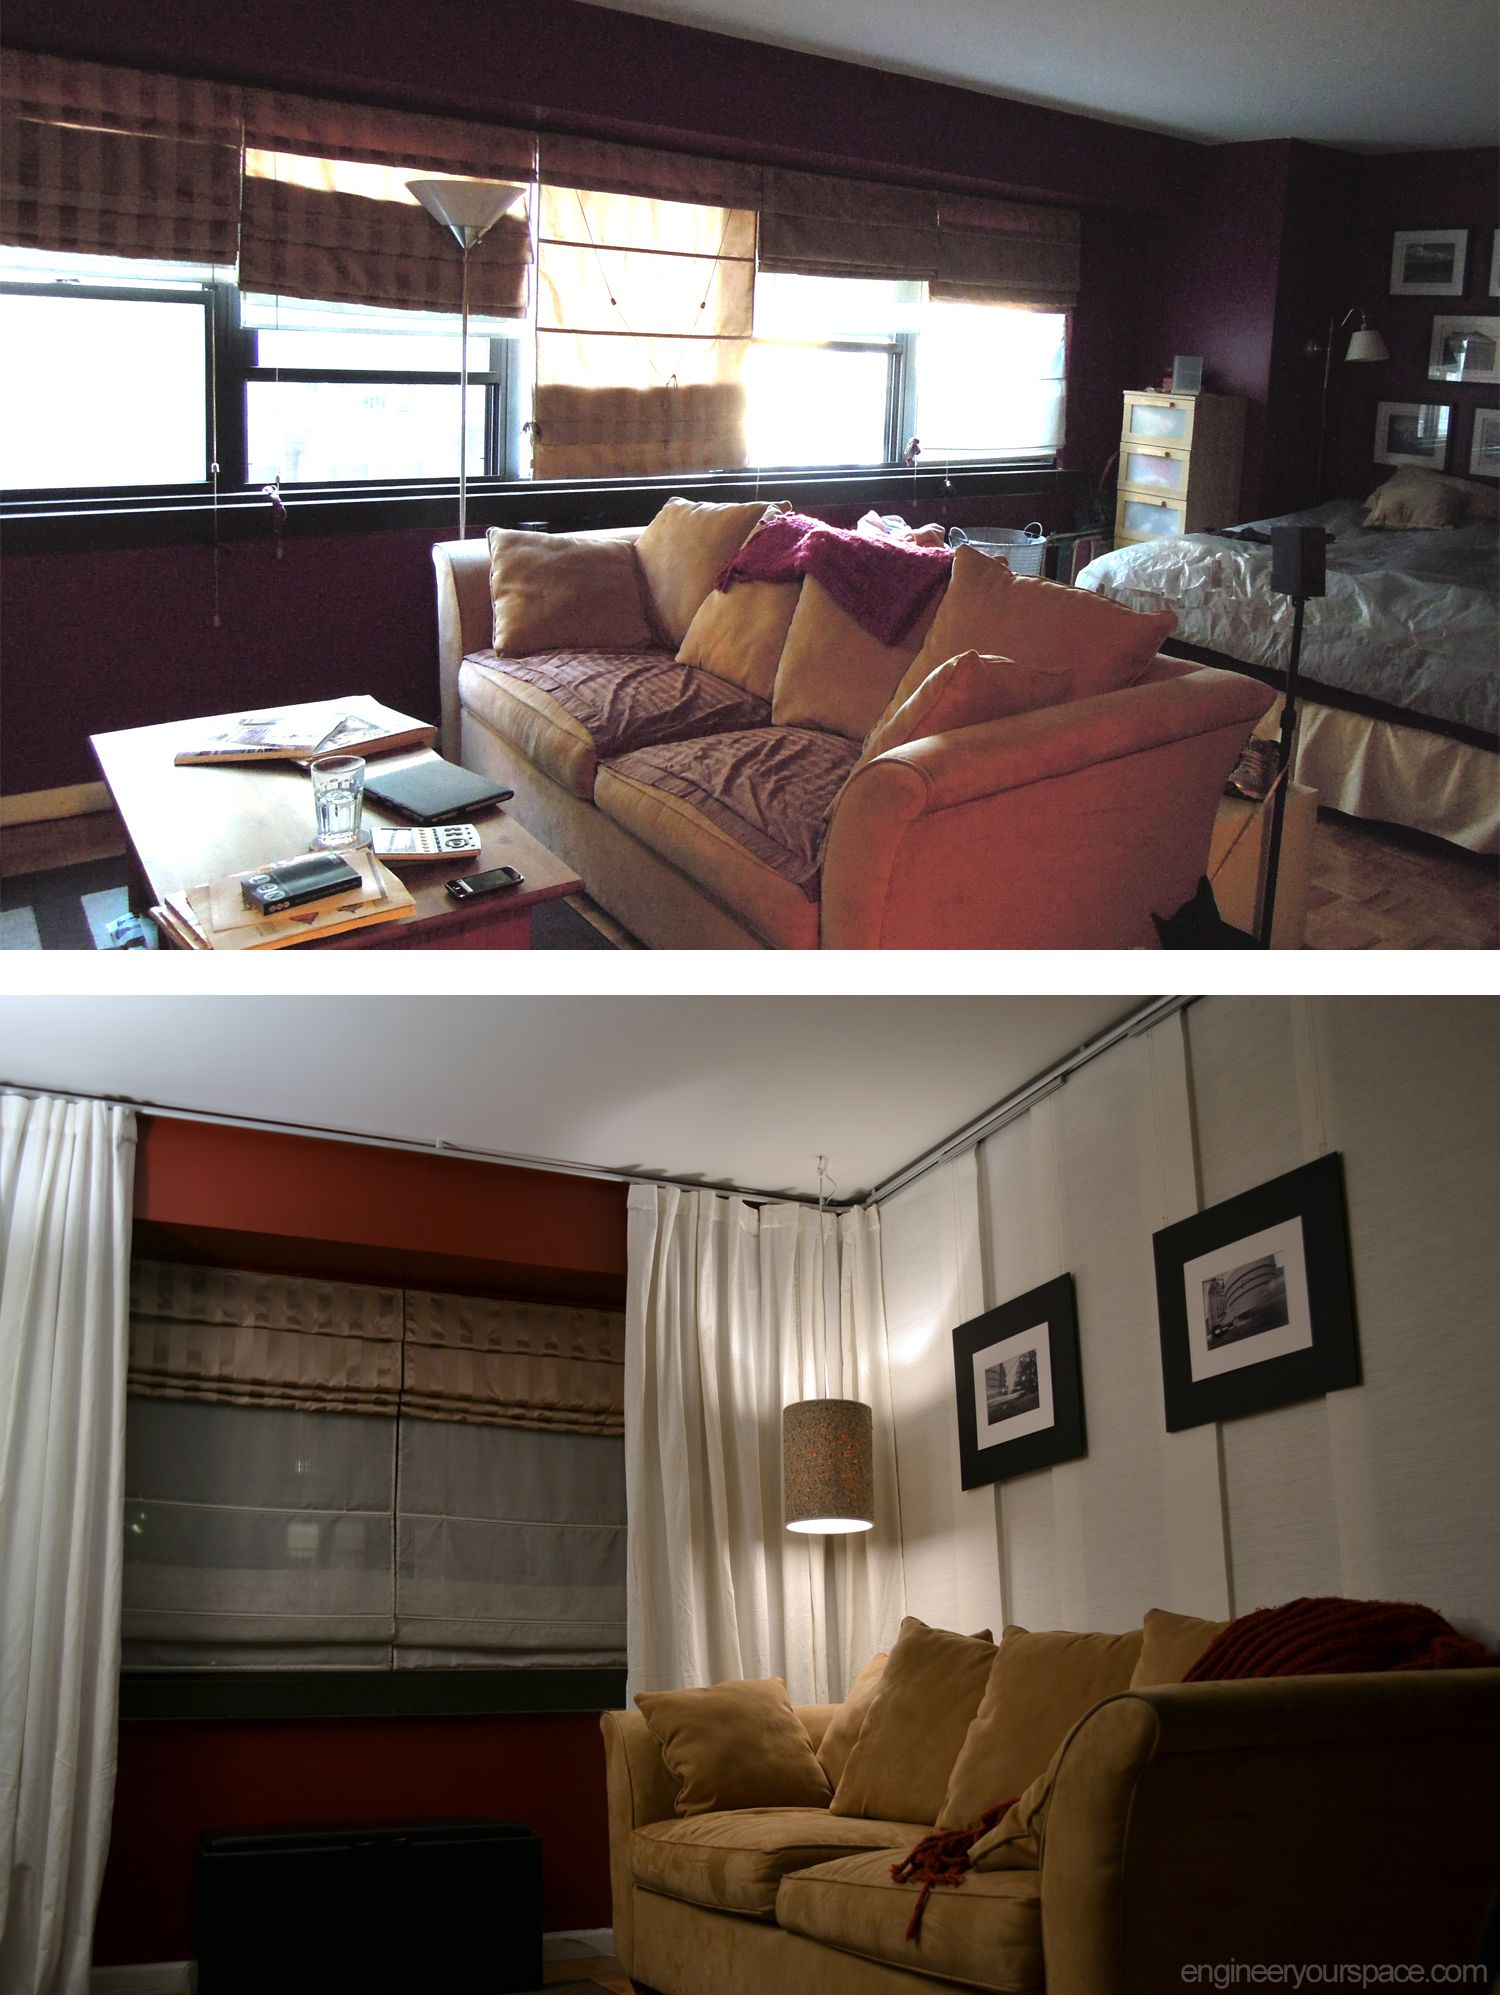 NYC Studio Apartment Makeover DIY Installation Of IKEA Kvartal Hanging Room Divider